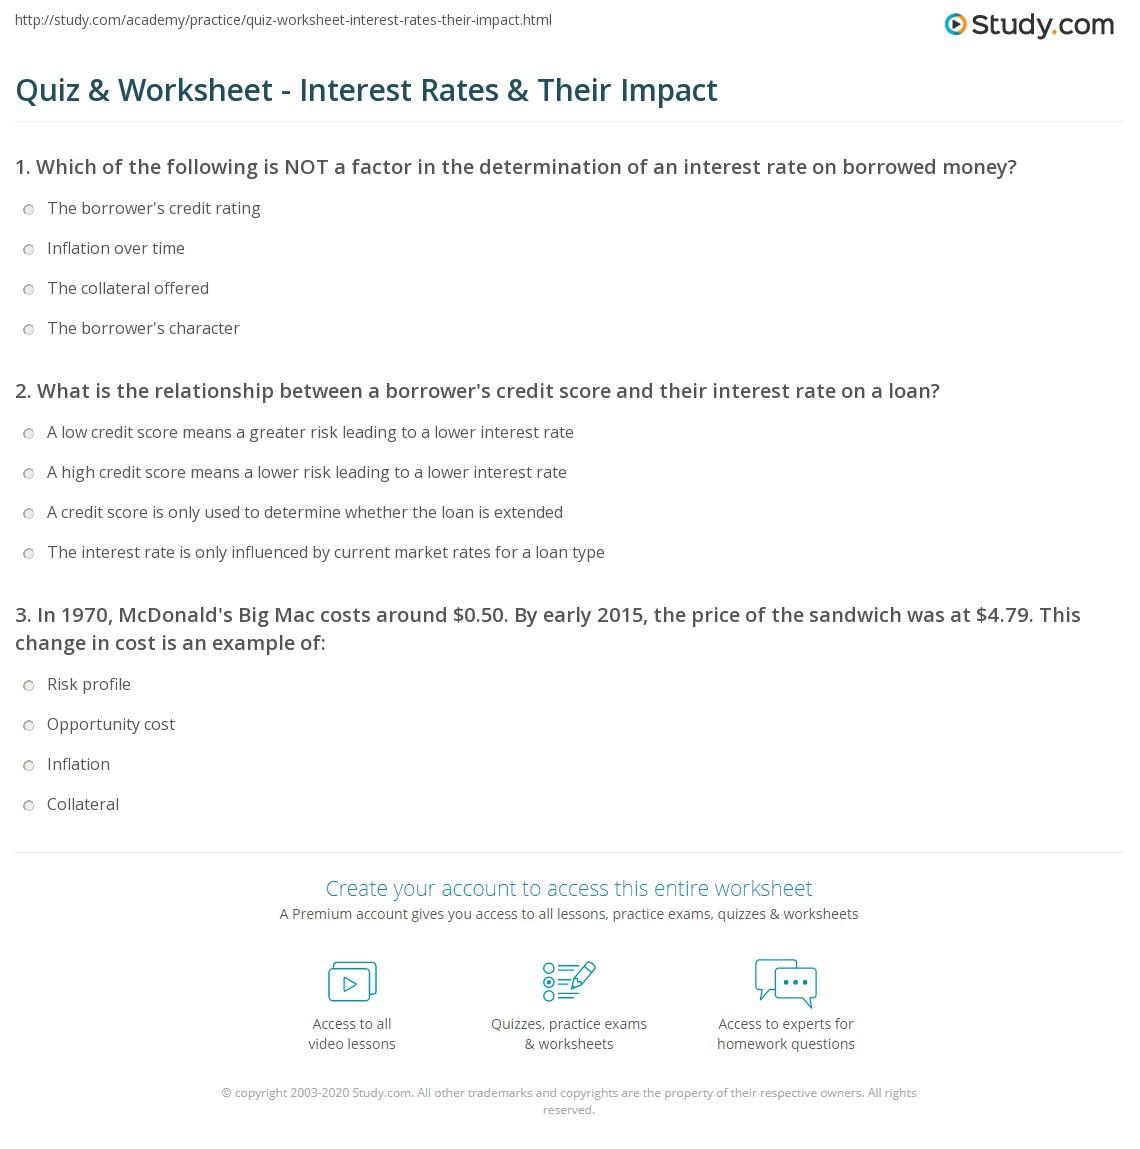 Quiz Worksheet Interest Rates Their Impact Study Com